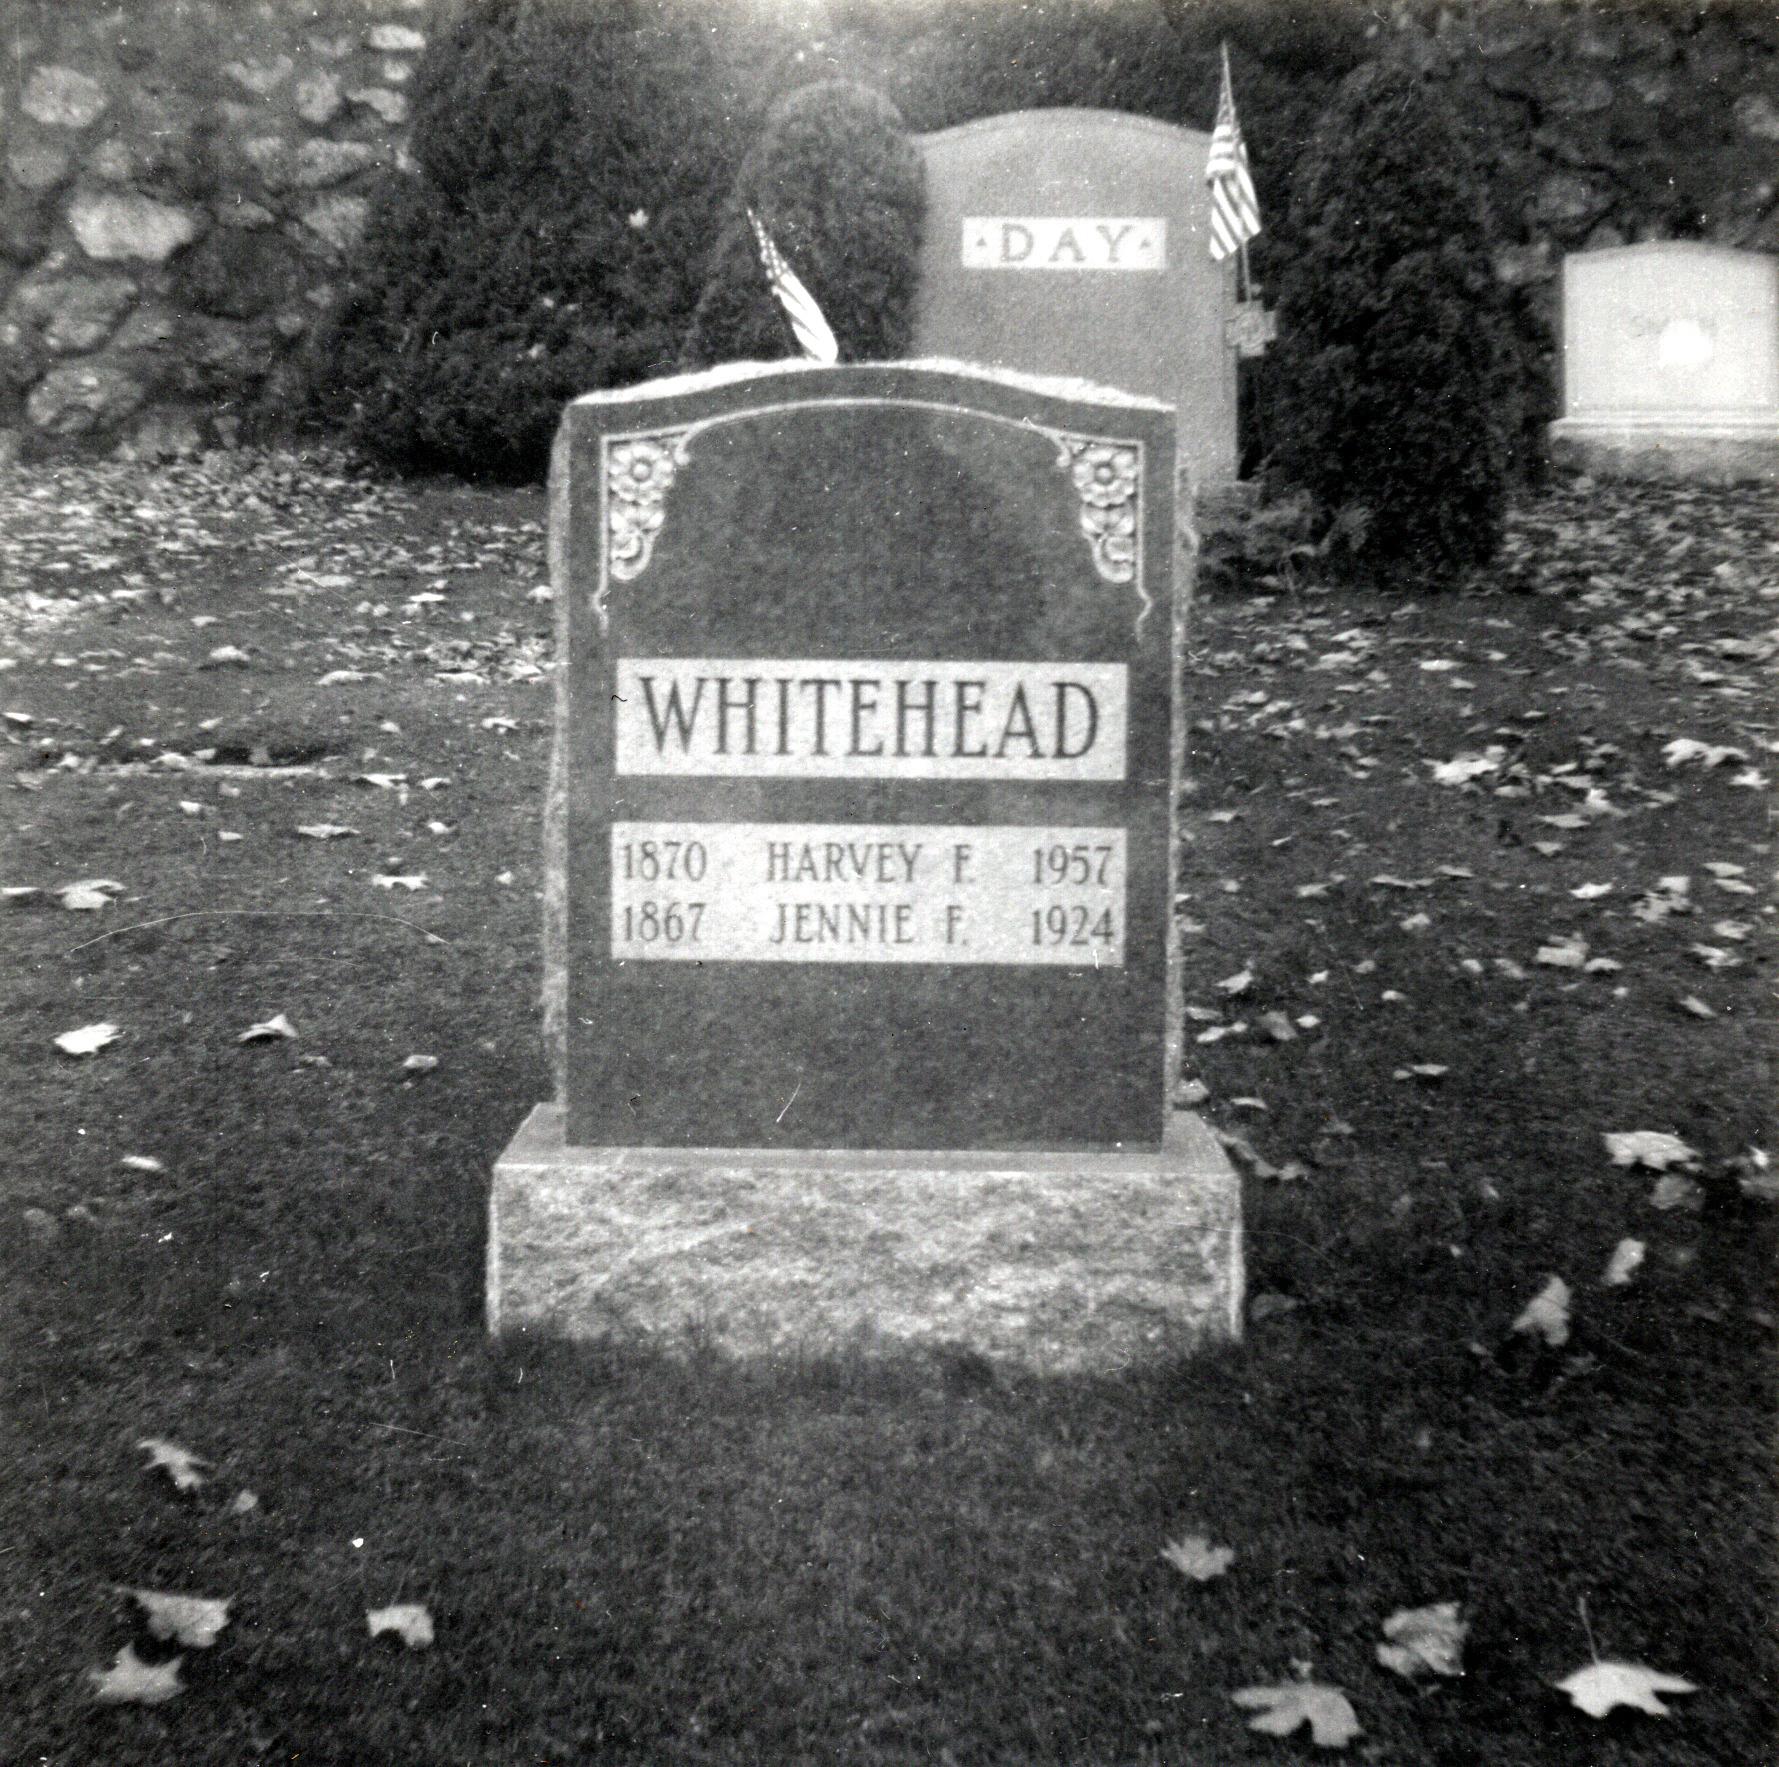 Harvey & Jennie Whitehead Headstone